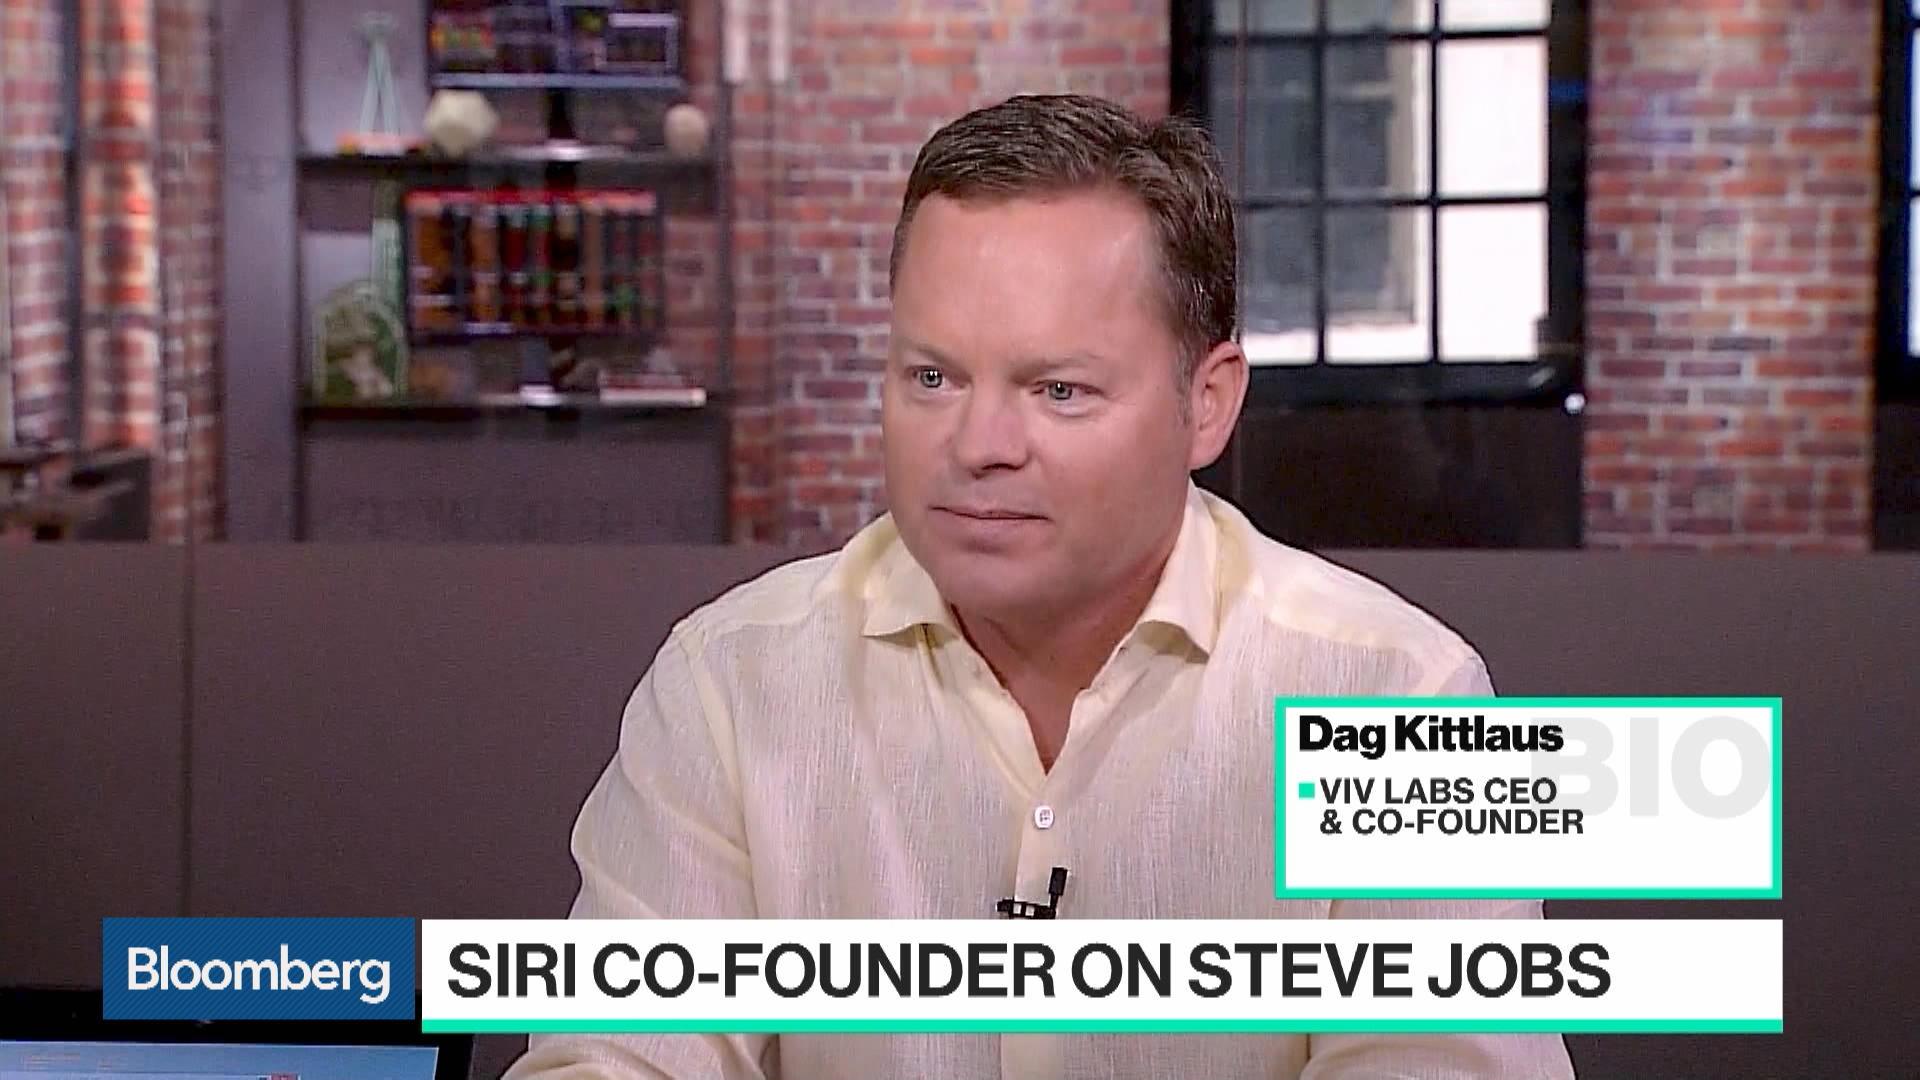 Siri Co-Founder Says Steve Jobs Was 'Relentless'